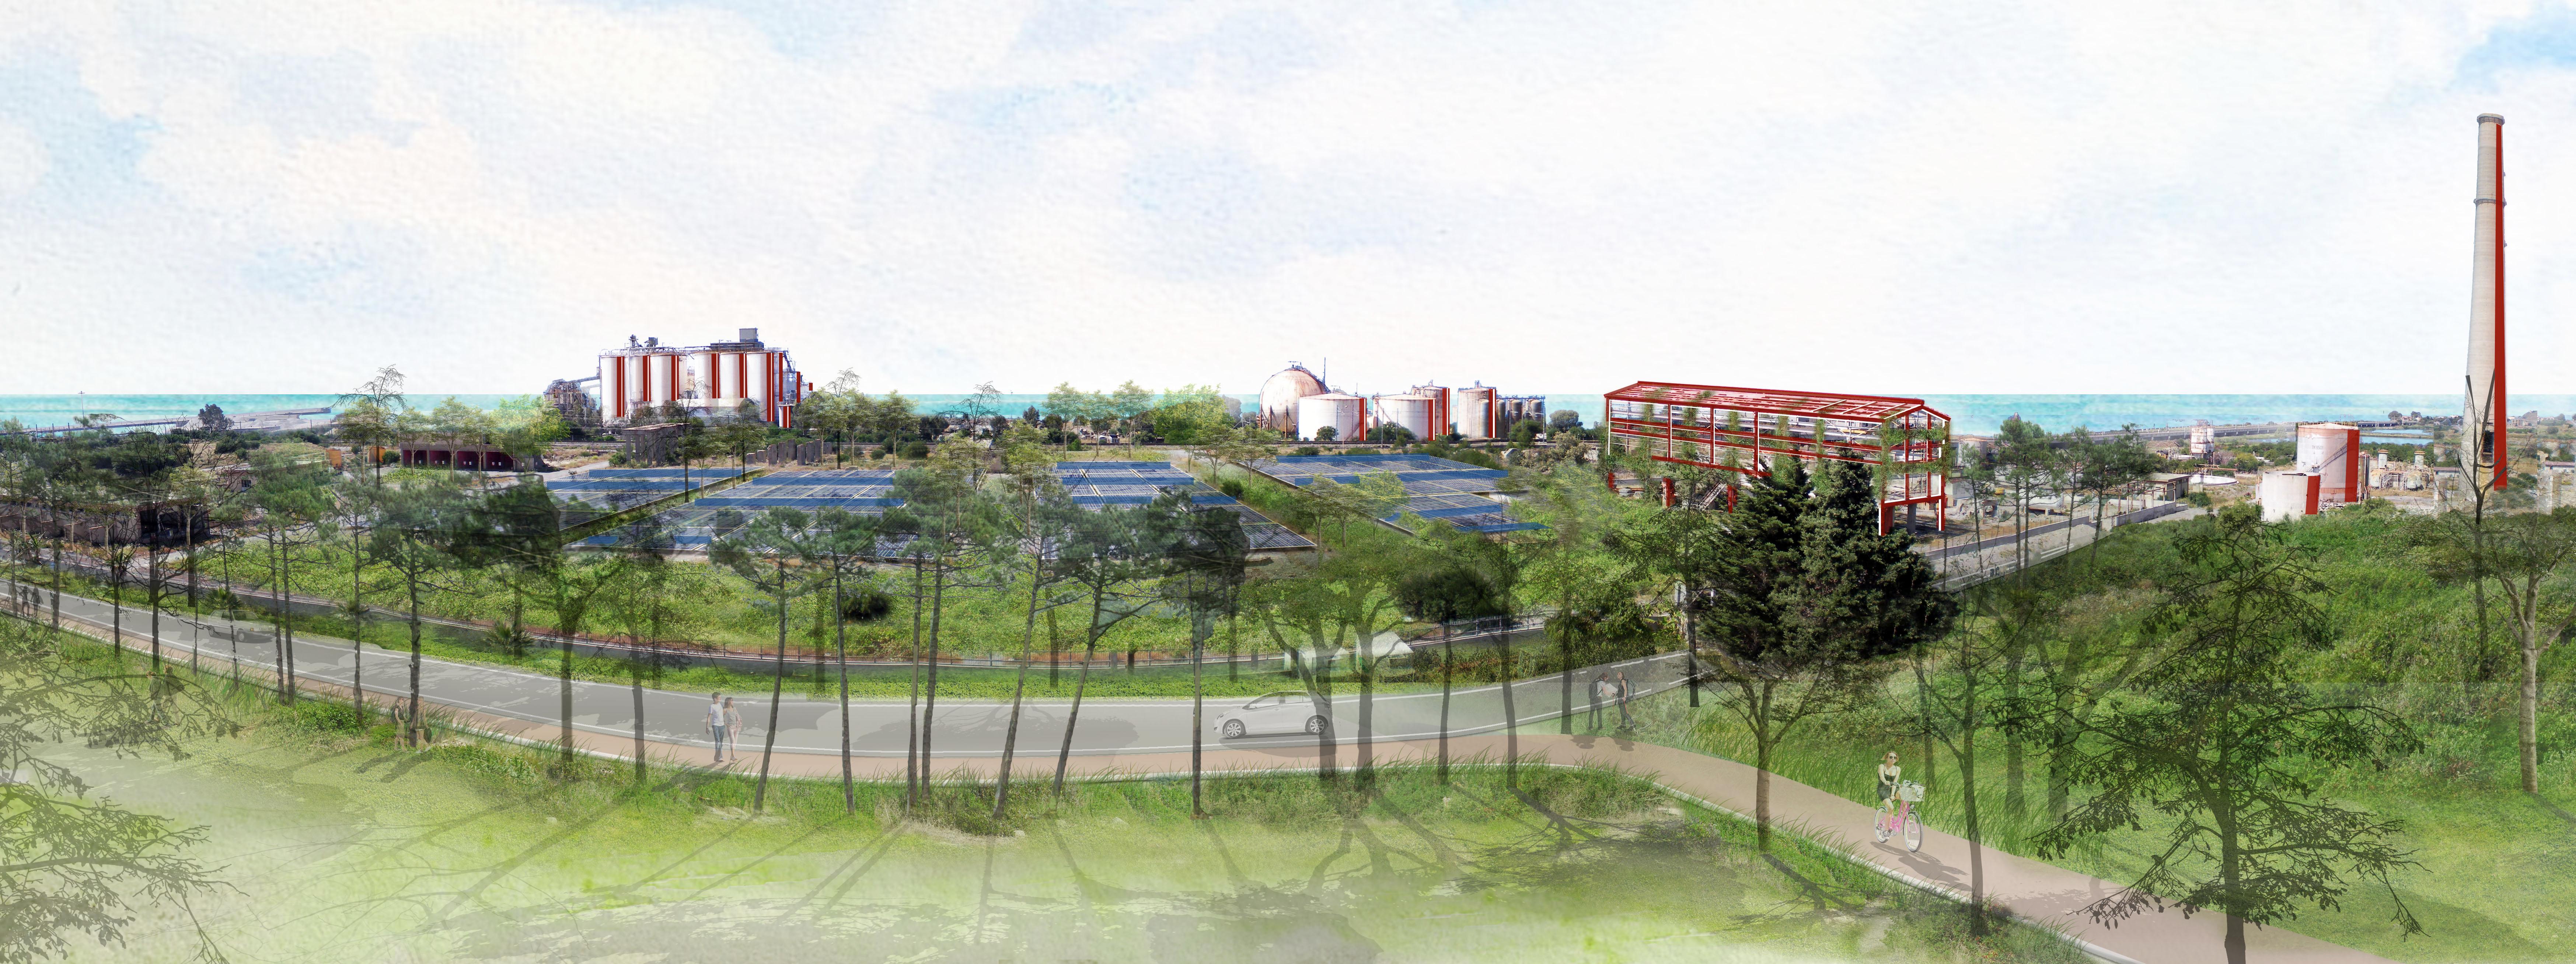 image2-  parco solare